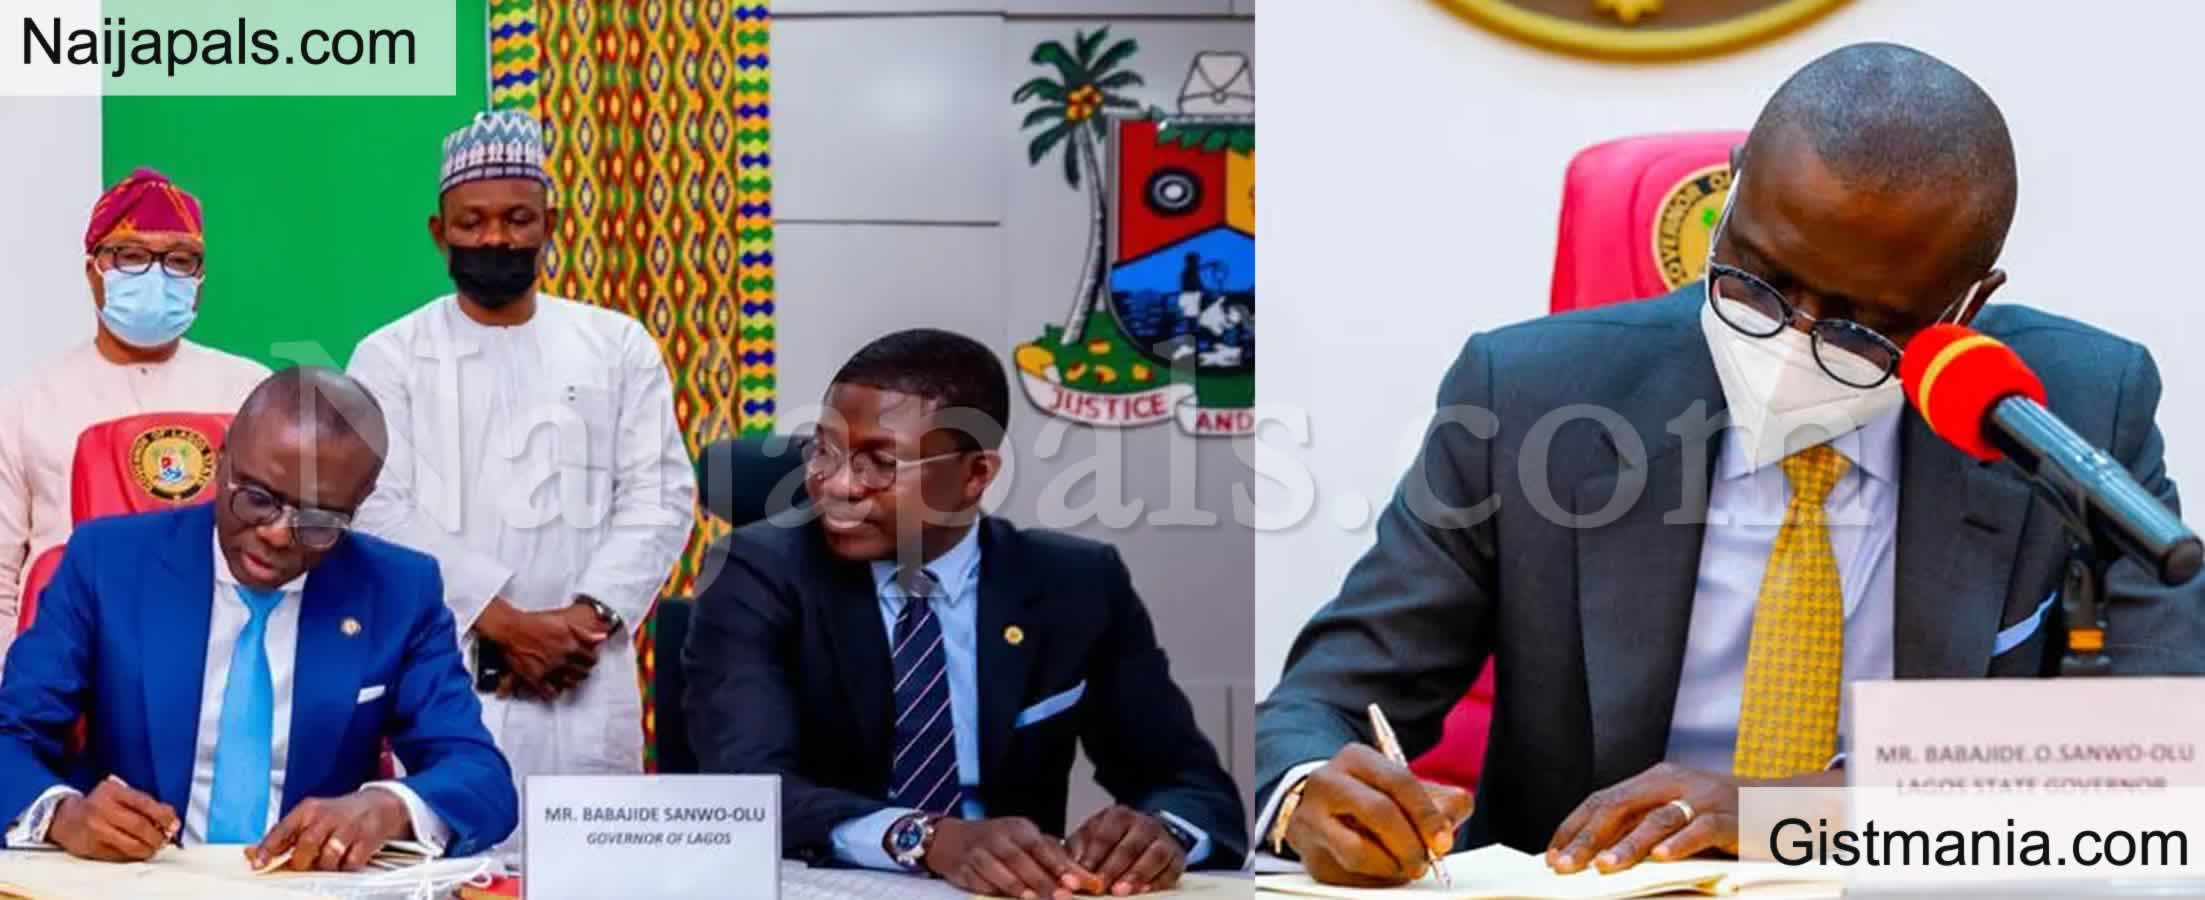 <img alt='.' class='lazyload' data-src='https://img.gistmania.com/emot/news.gif' /> <b>Lagos Gov. Babajide Sanwo-Olu Signs Bill Seeking To Jail Armed Herdsmen For 21-Year</b>